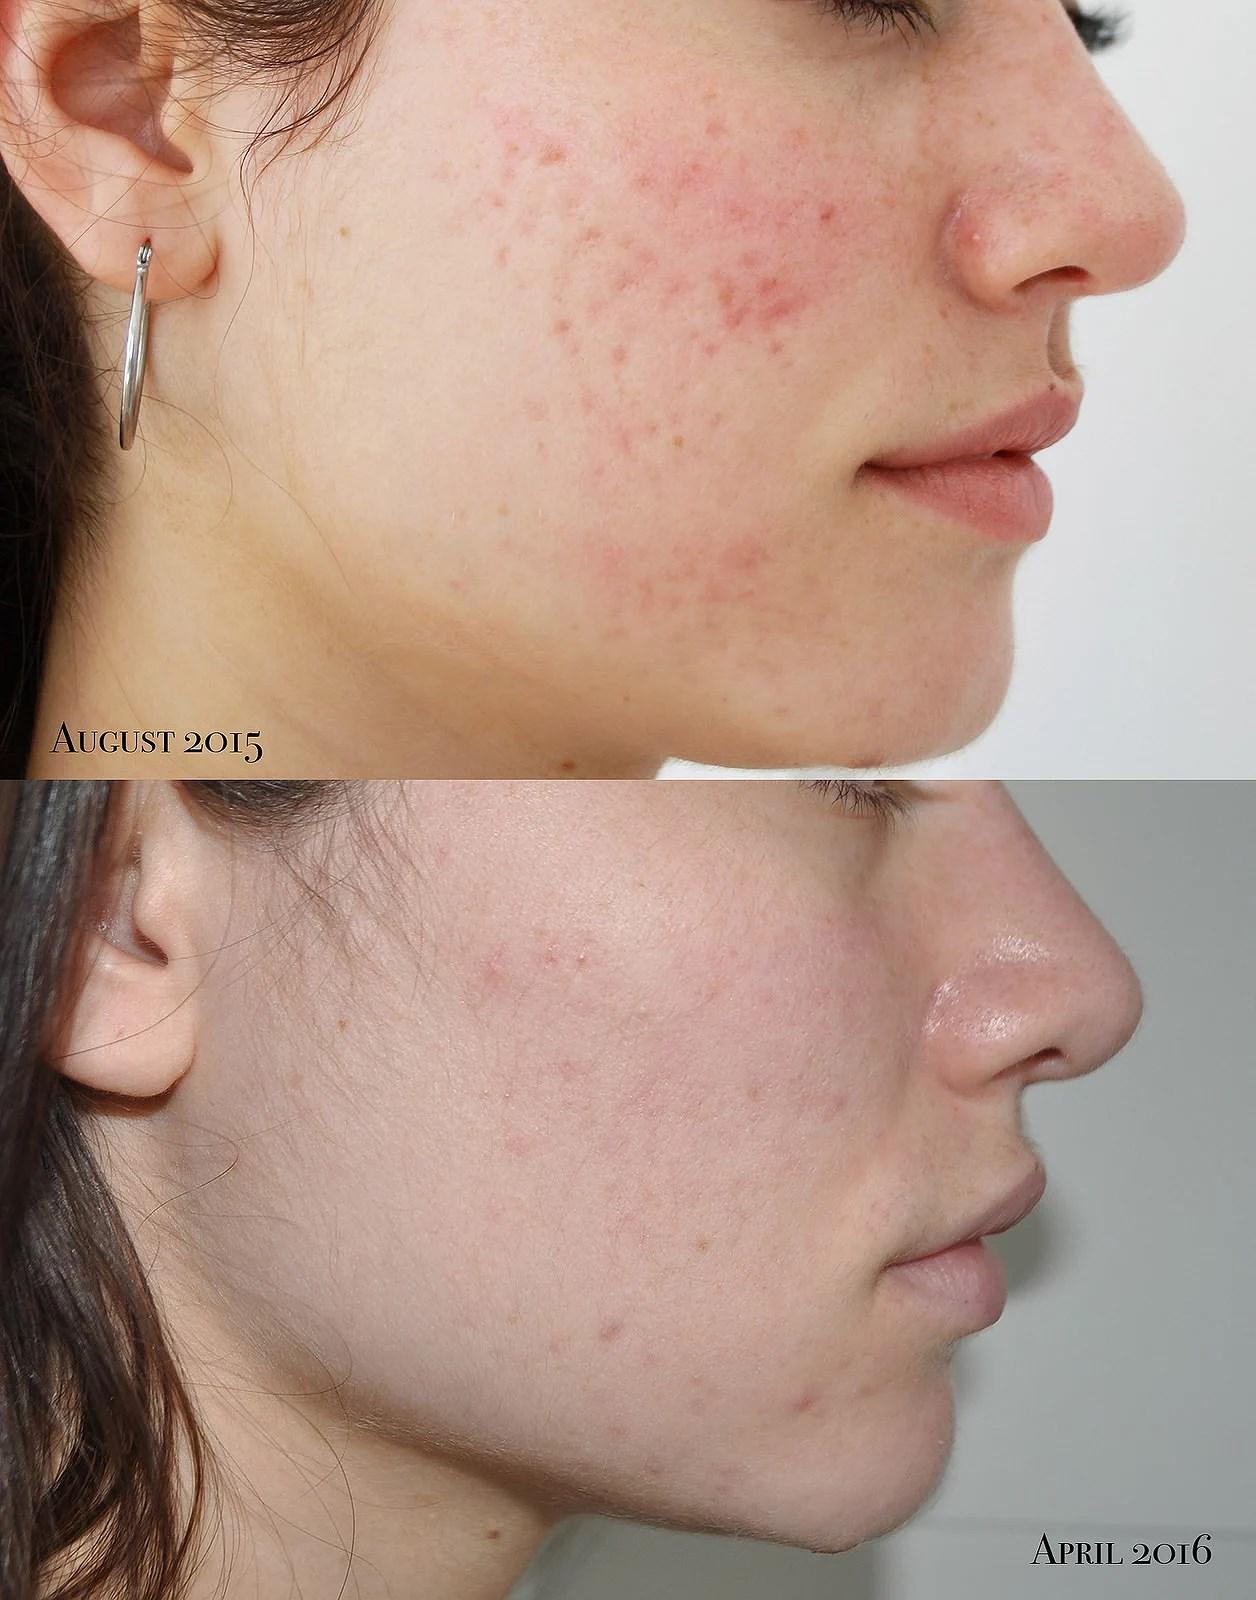 ilirida serum8 klinikbehandlinger akne ar dermaroller